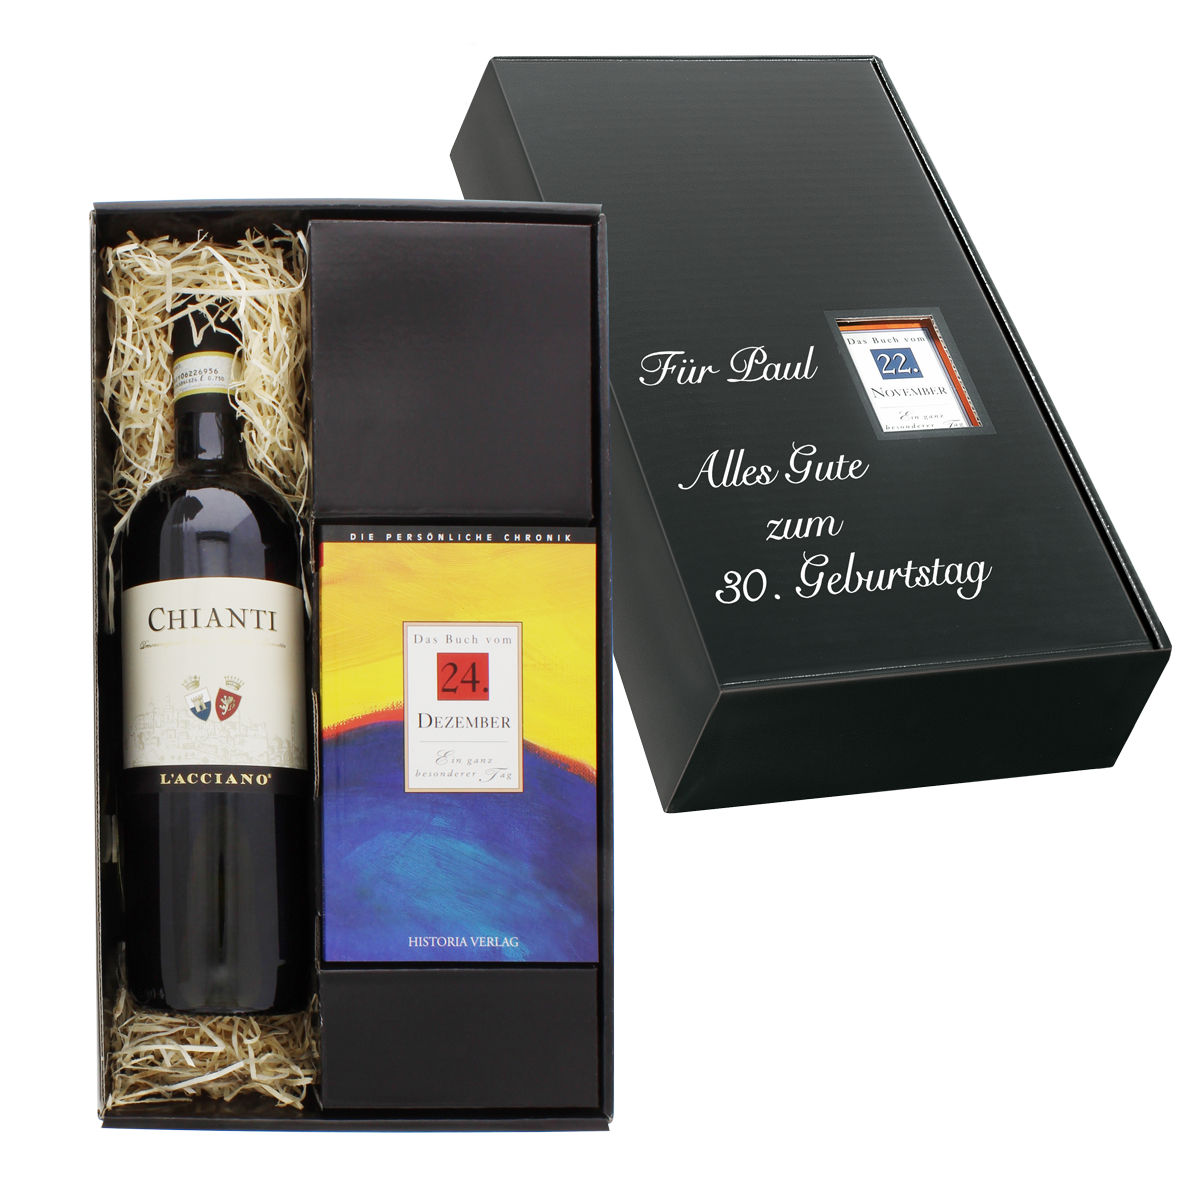 Italien-Set: Tageschronik vom 13. Januar & Chianti-Wein